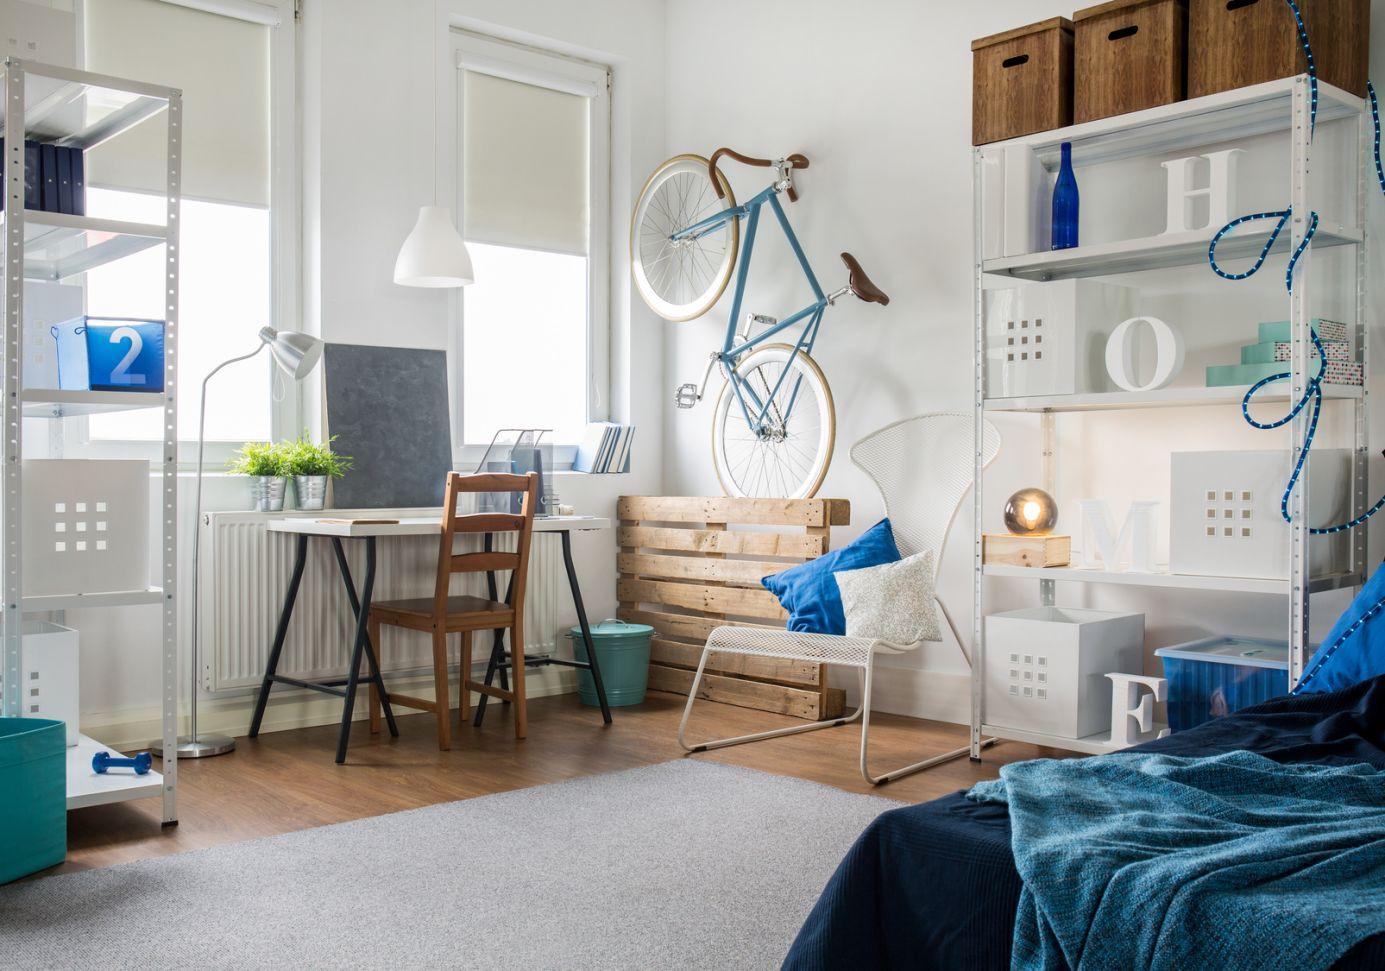 comment optimiser les petits espaces log home. Black Bedroom Furniture Sets. Home Design Ideas